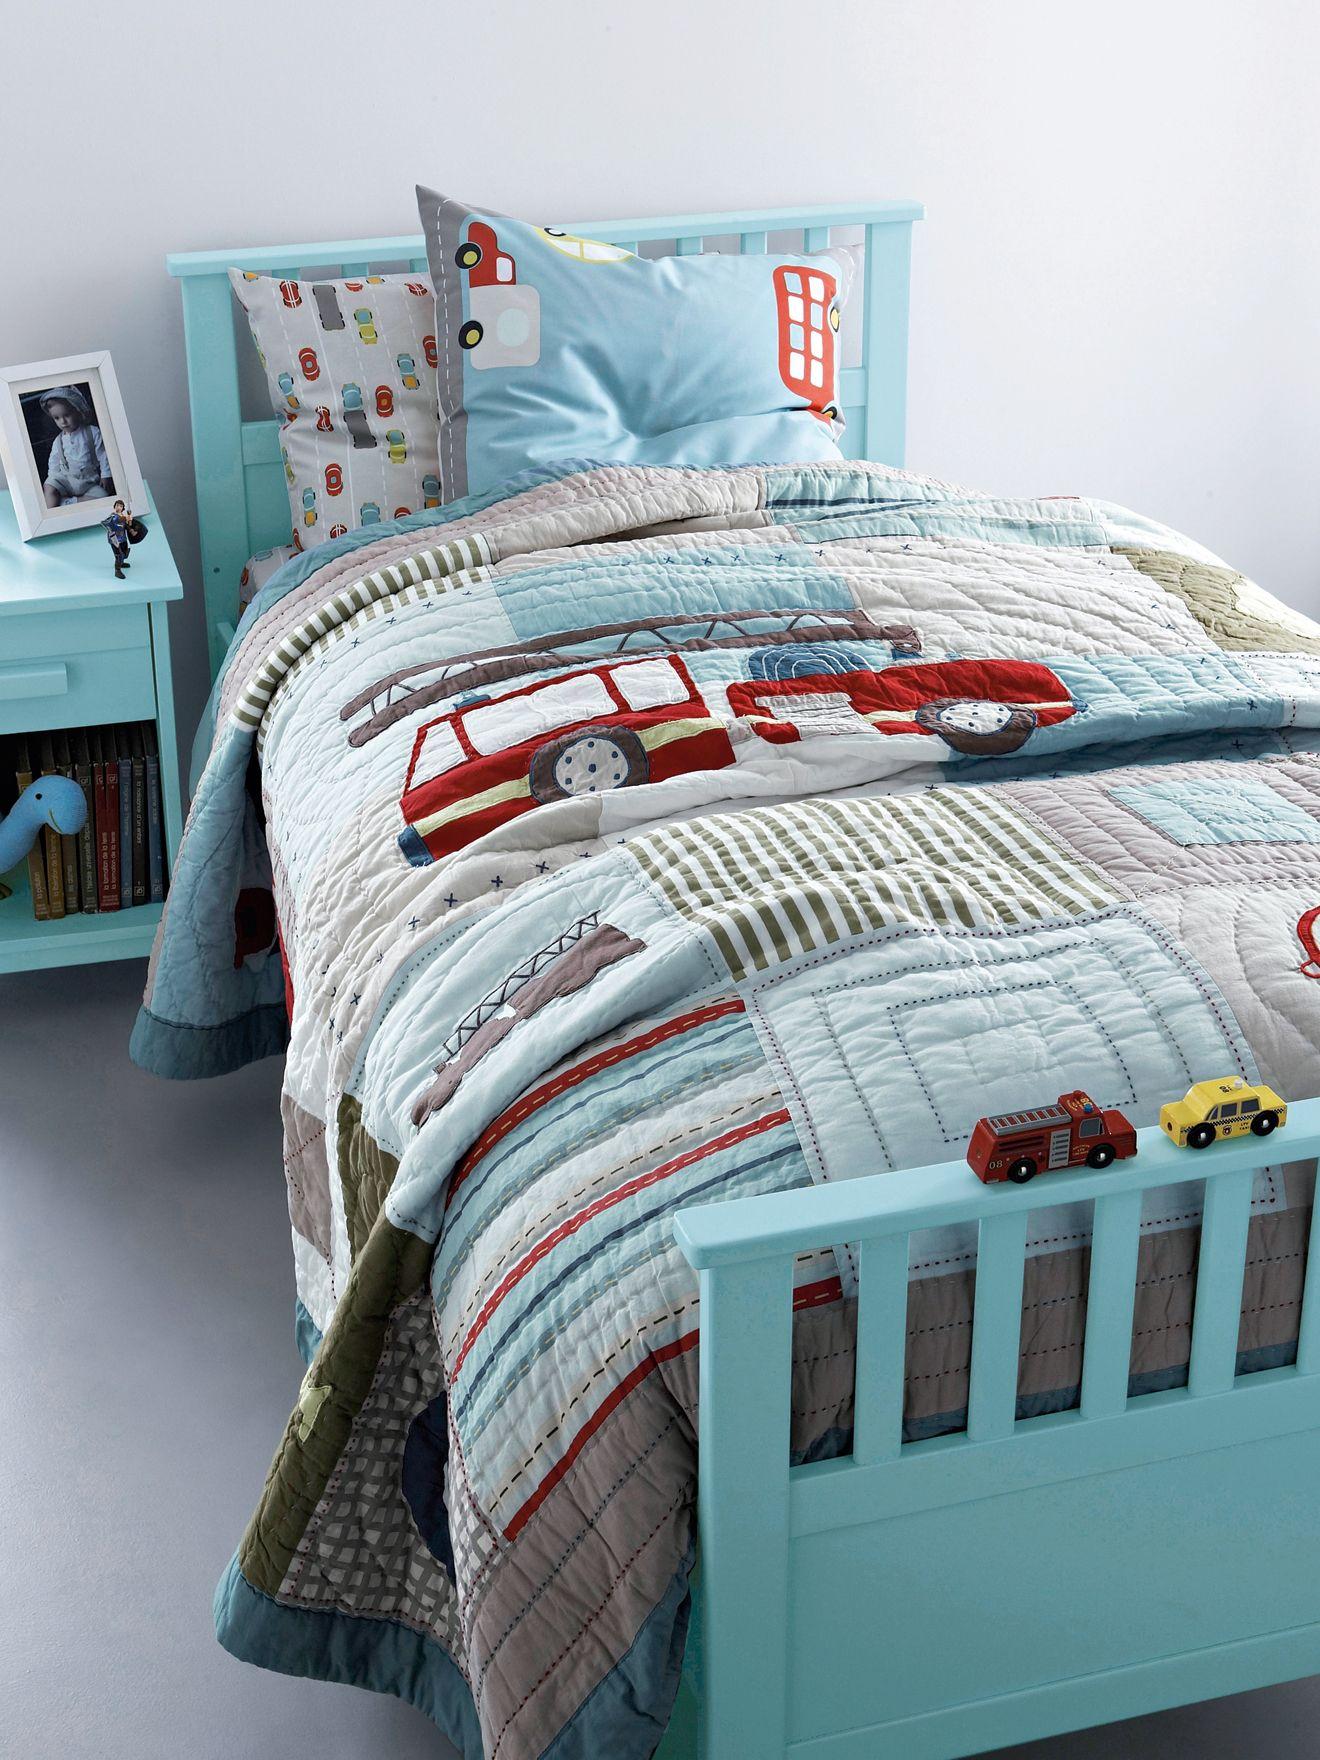 jet de lit en boutis gar on pompier chambre enfant d co chambre enfants pinterest jet. Black Bedroom Furniture Sets. Home Design Ideas